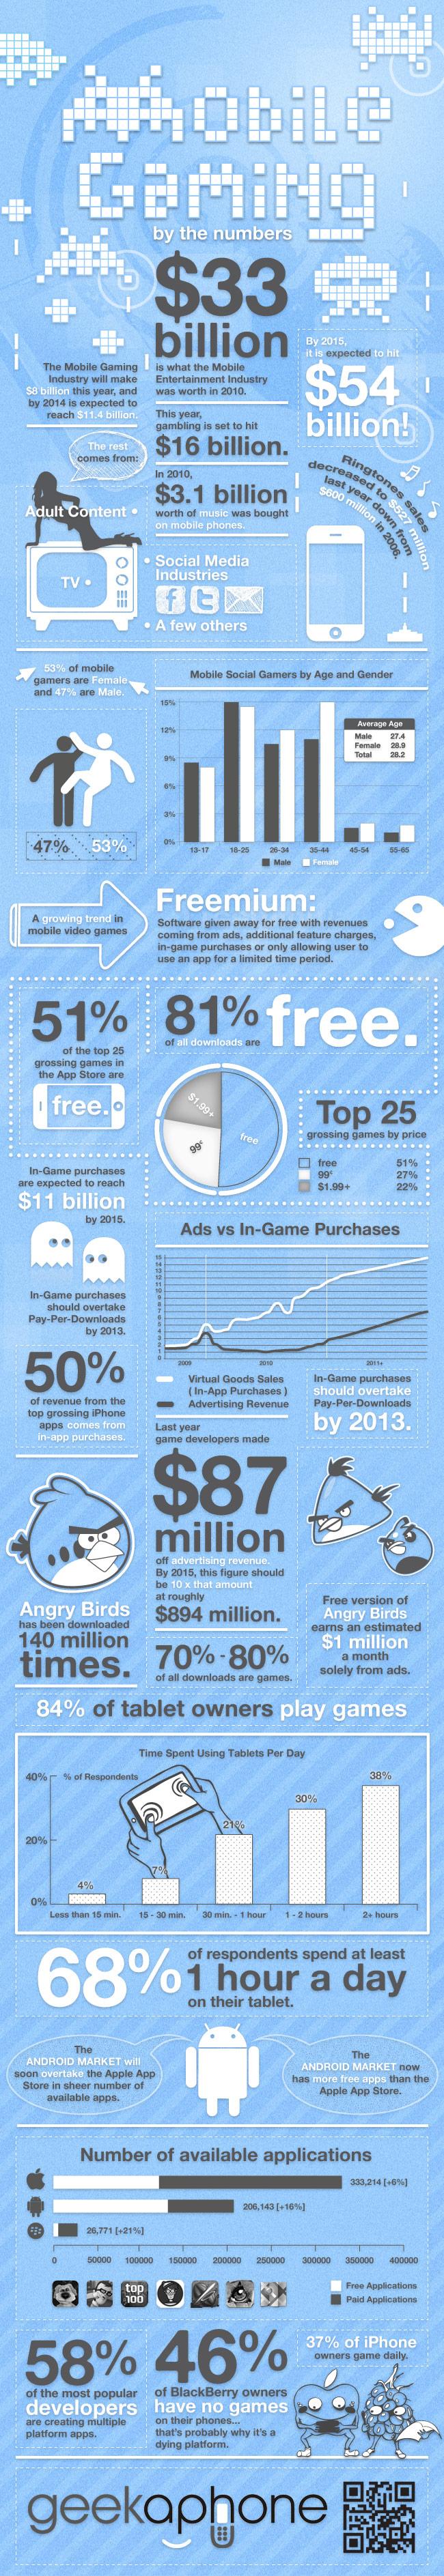 Infográfico - Mobile gaming